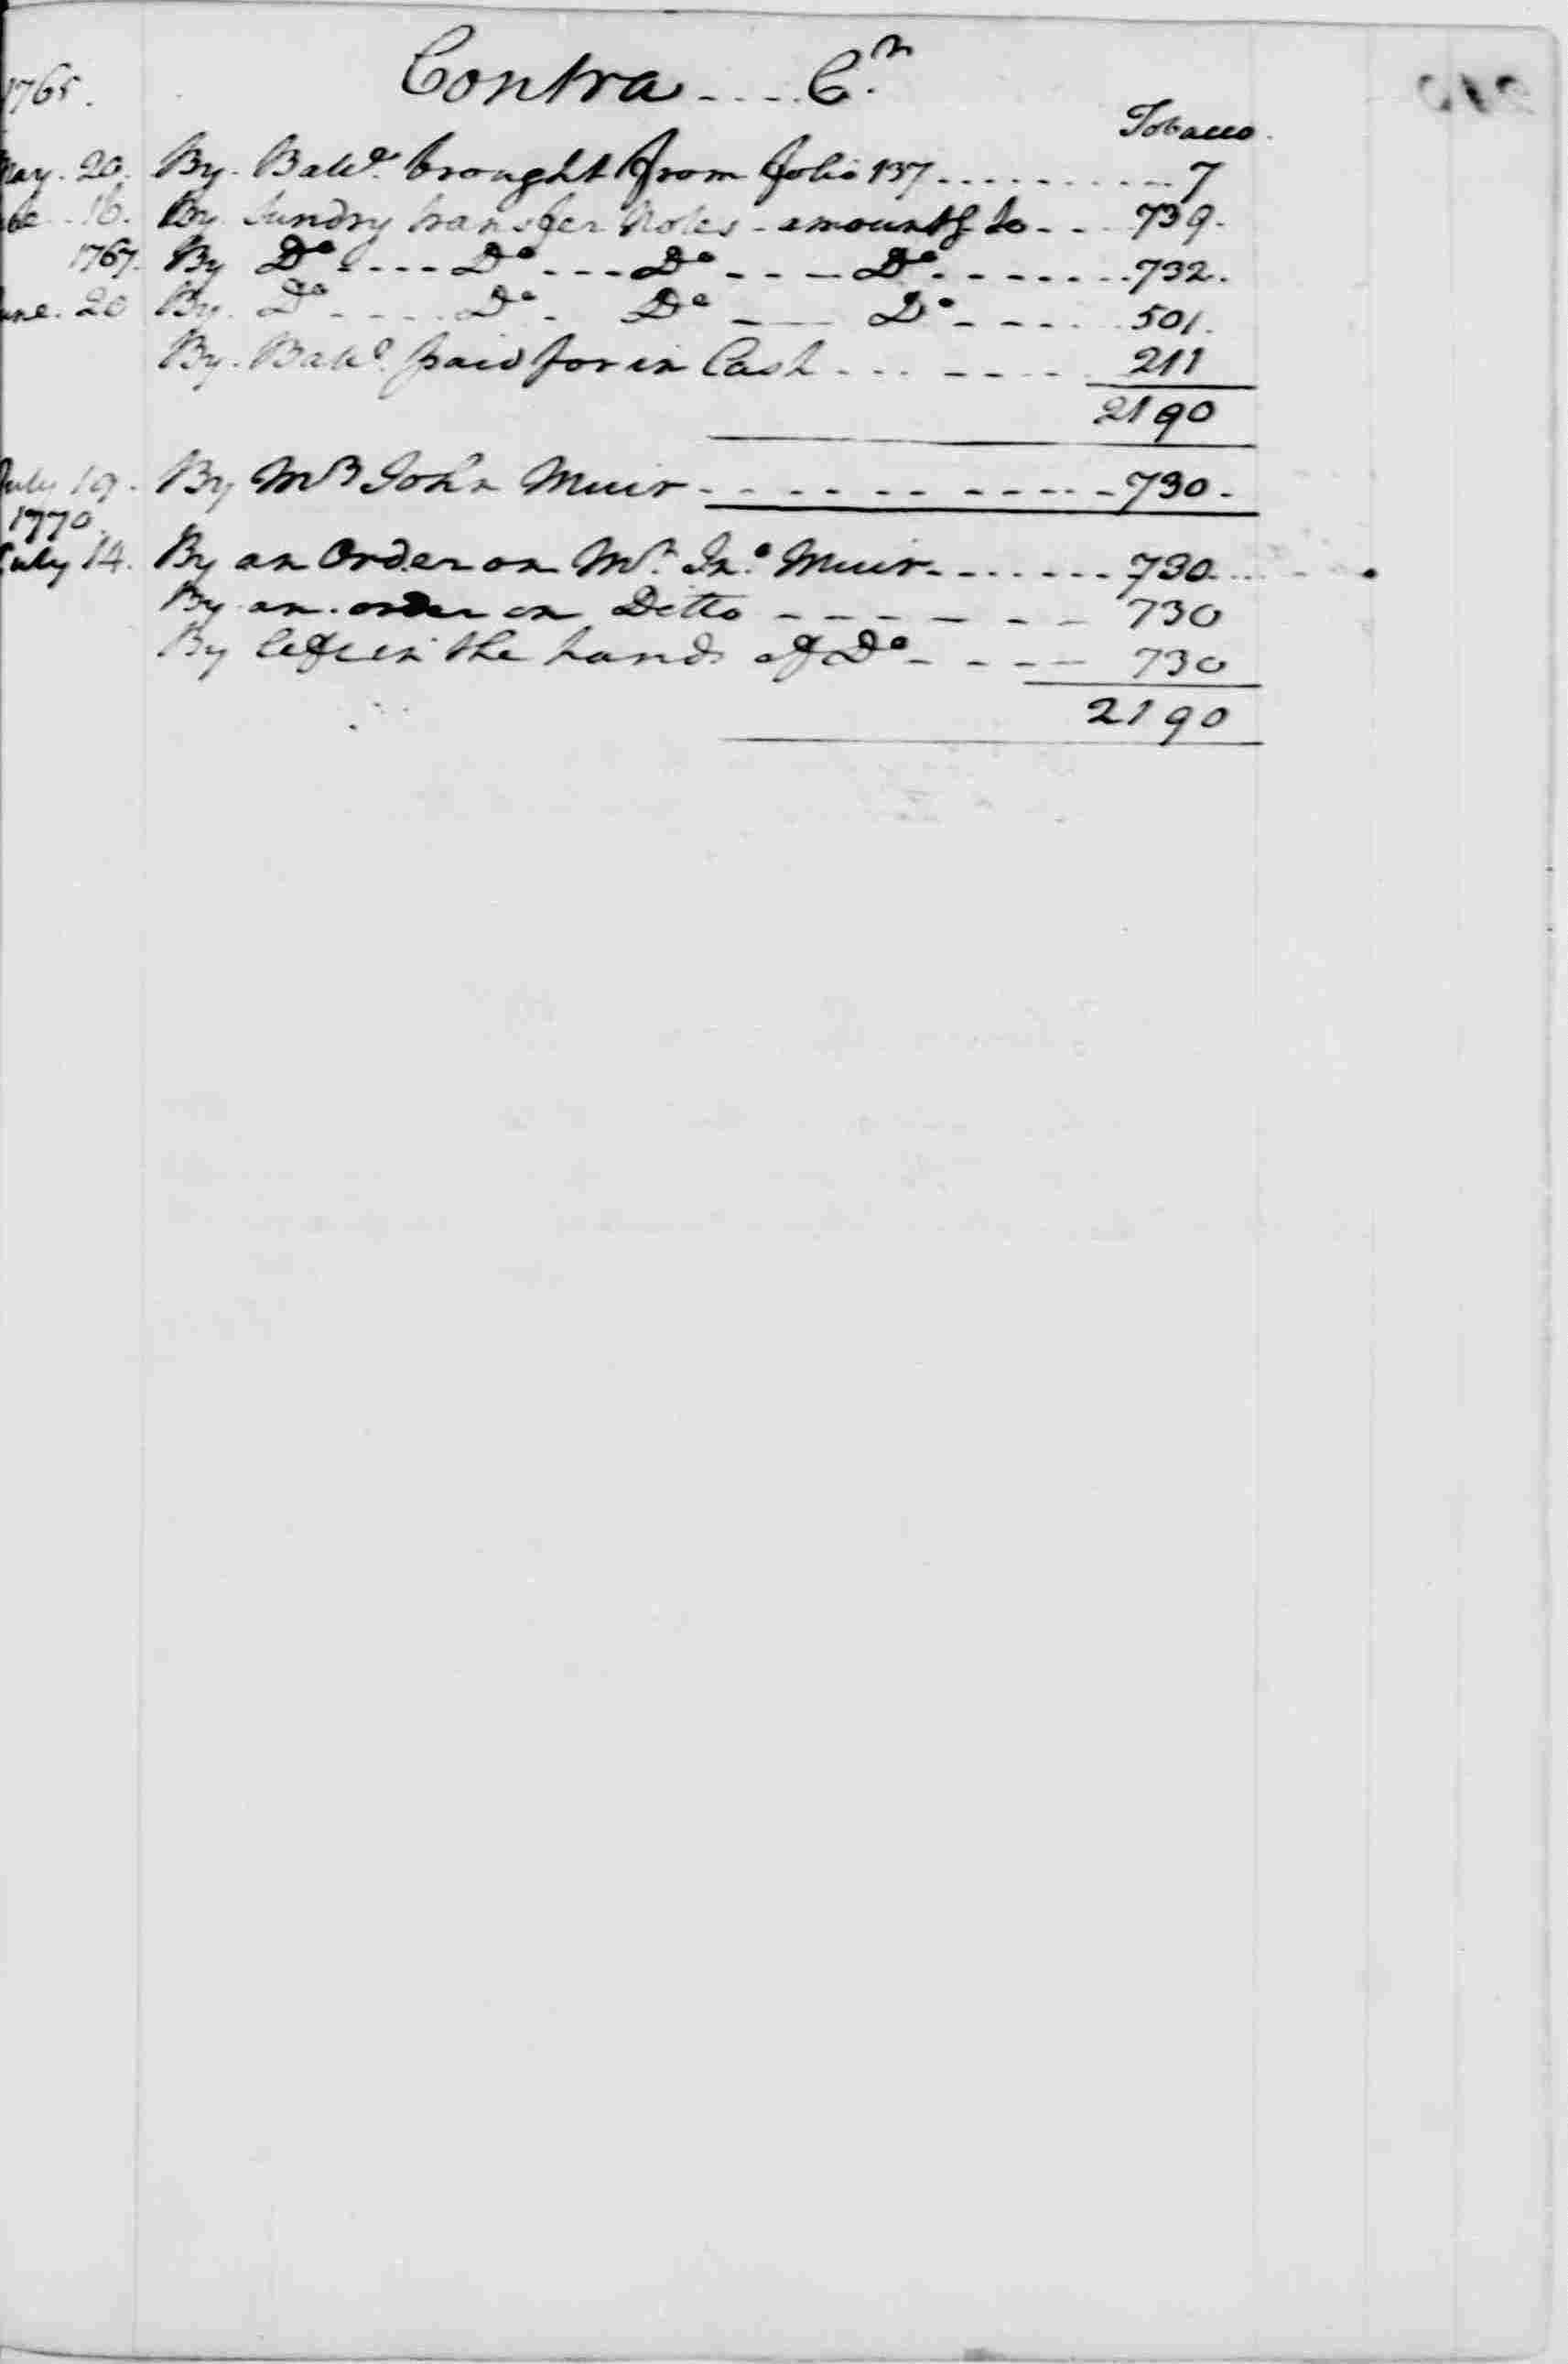 Ledger A, folio 209, right side